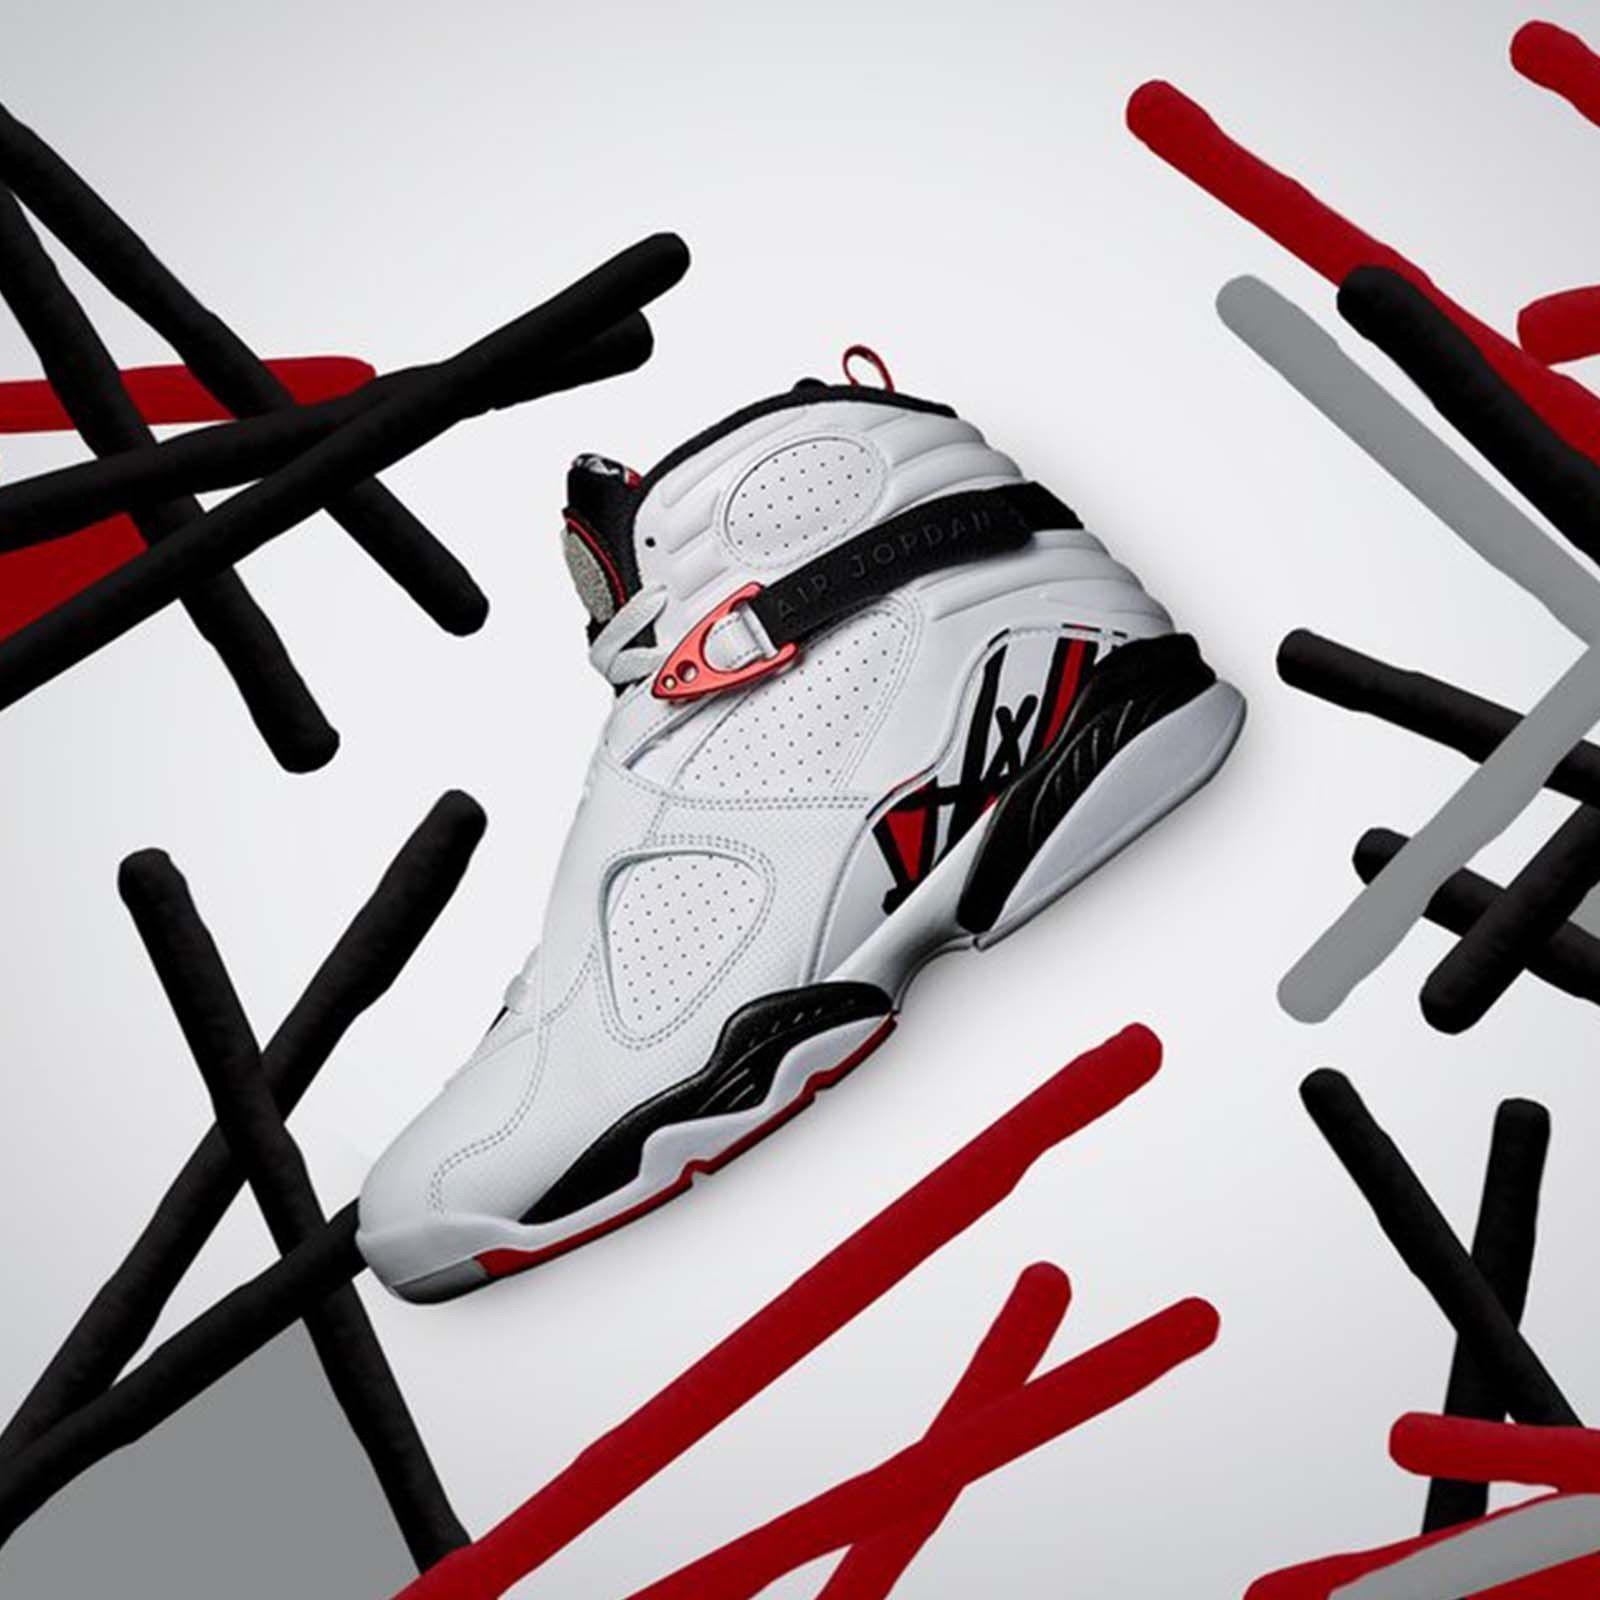 online store dd69f 4f3b7 Nike Air Jordan 8 Retro VIII Alternate Collection White Red Men AJ8  305381-104